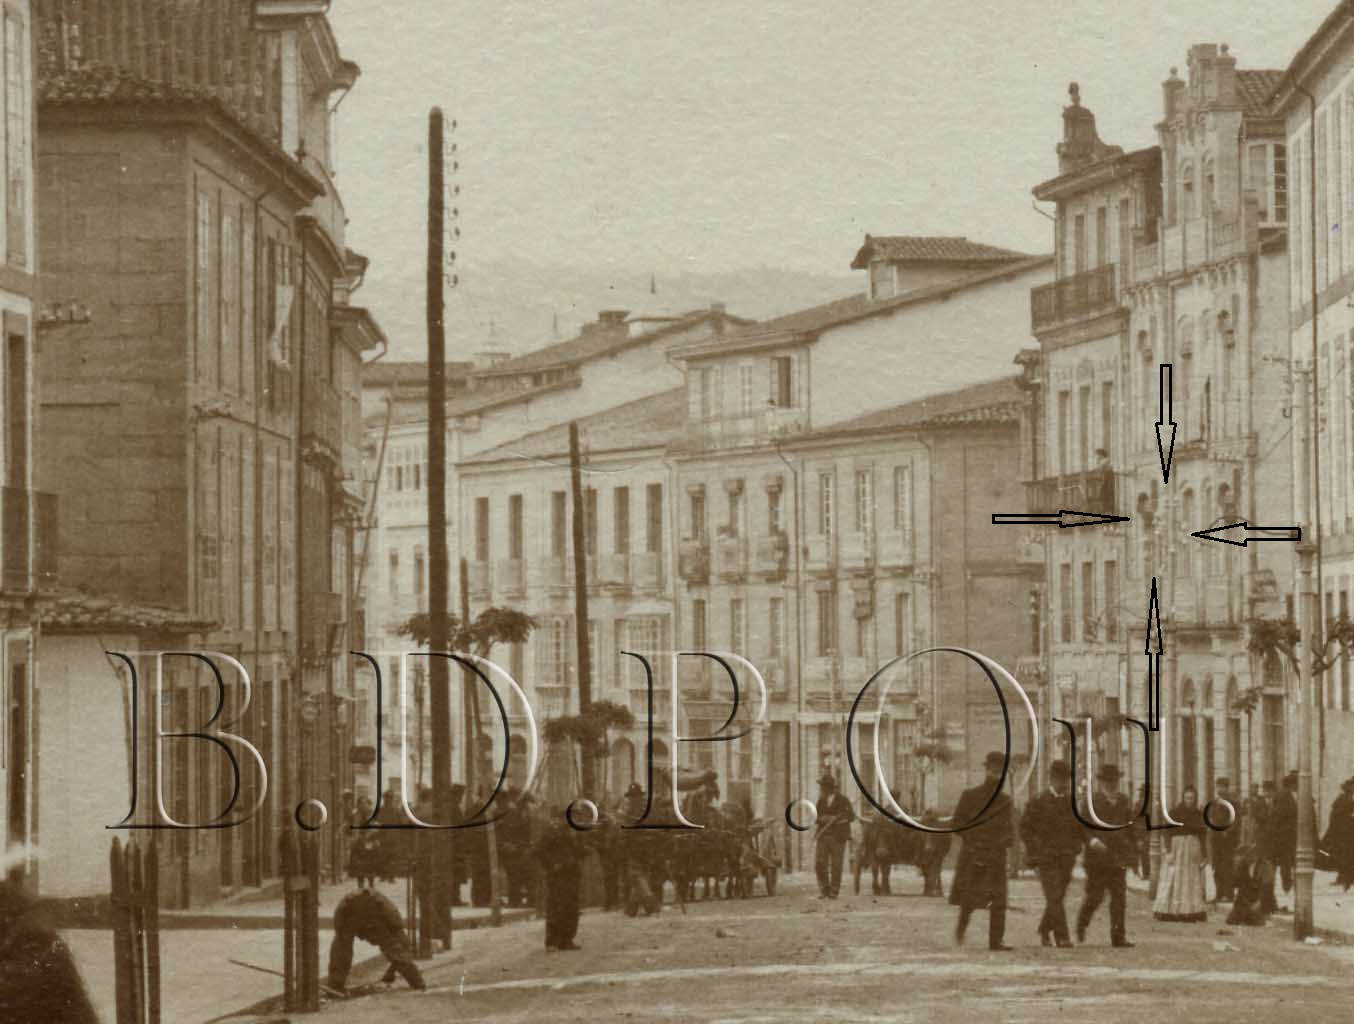 Ourense no tempo la cara de auria misterios sin explicaci n for Episodios cuarto milenio